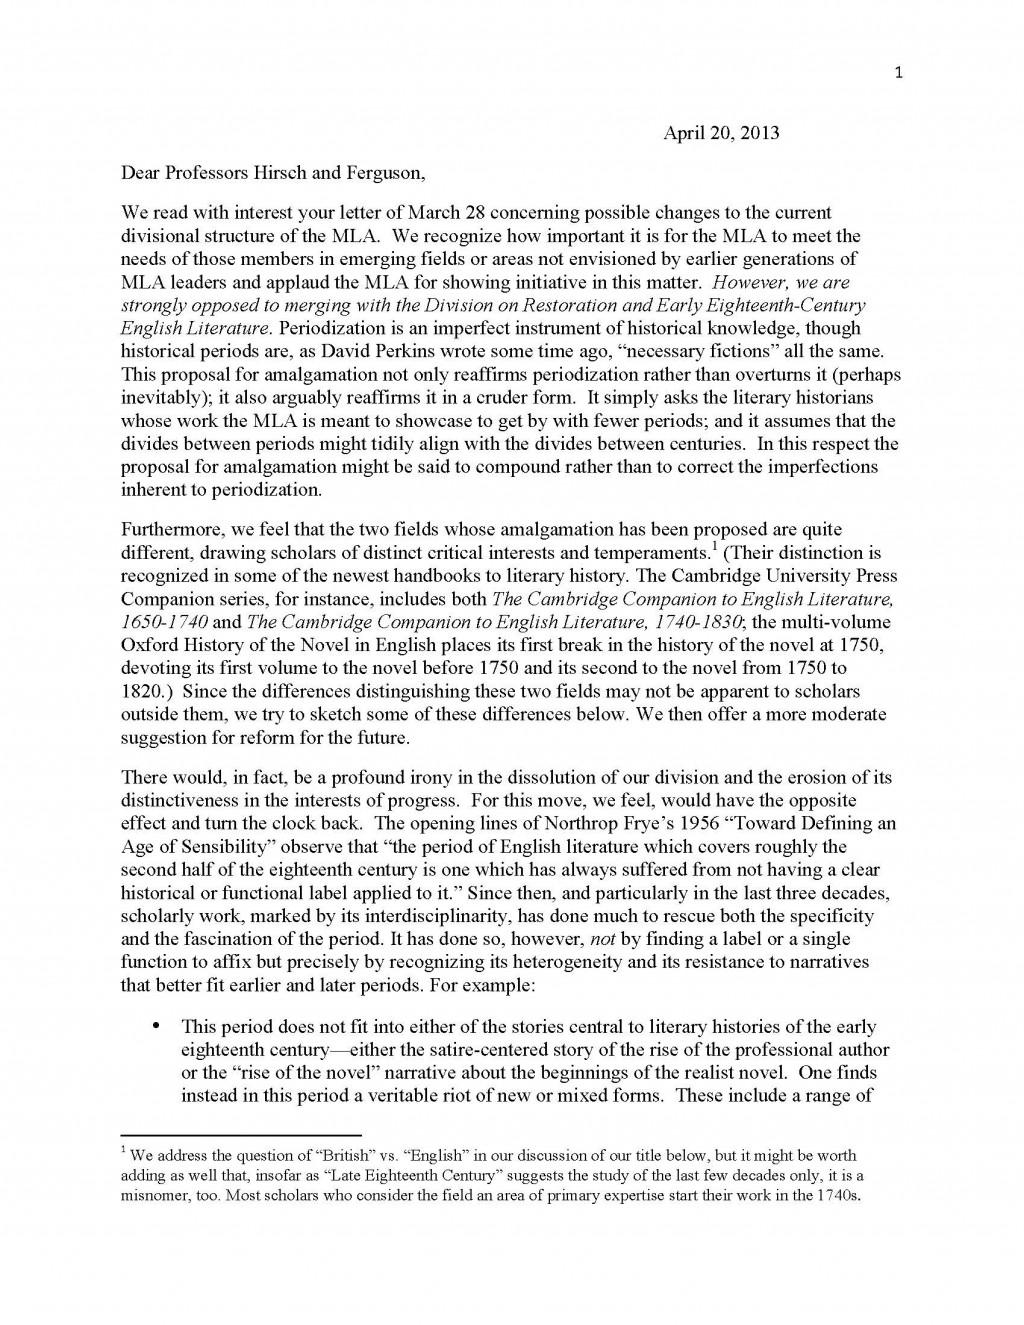 008 Essay Proposal Response To Marianne Hirsch Margaret Ferguson Rev Final Copy Page 1 Top Samples Mla Format Satirical Ideas Large